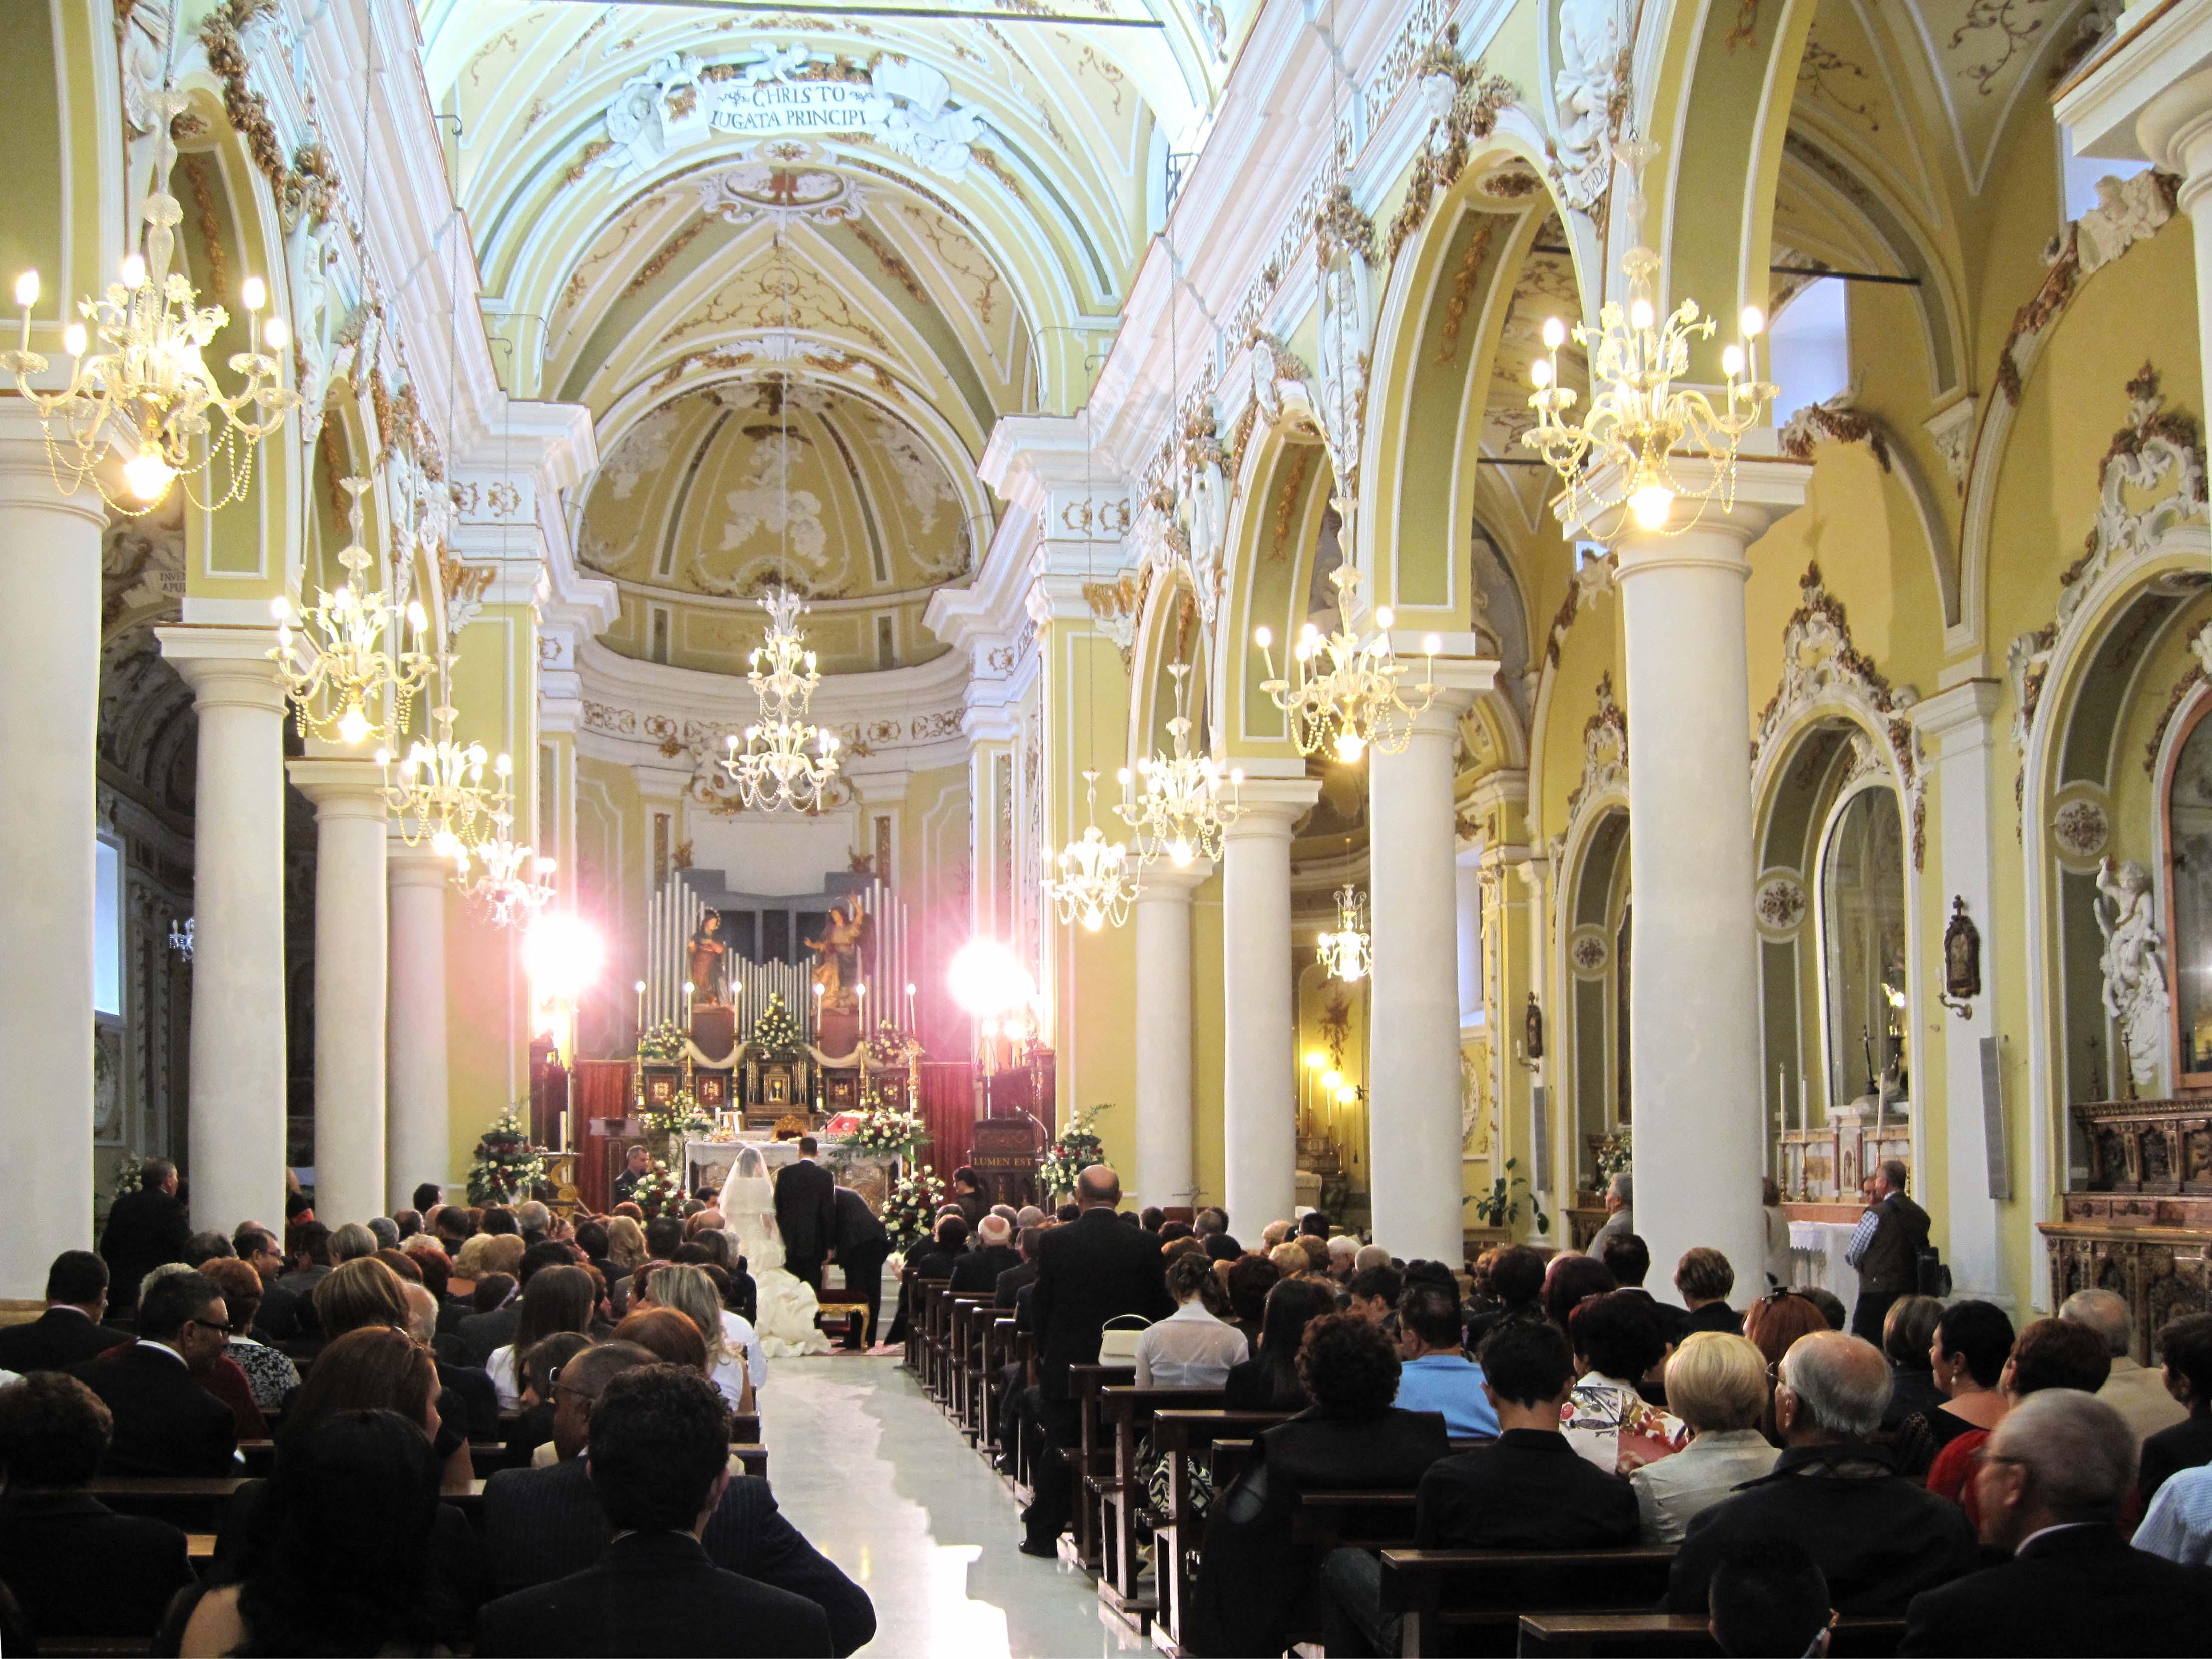 Matrimonio In Chiesa : File img matrimonio in chiesa ma quanti